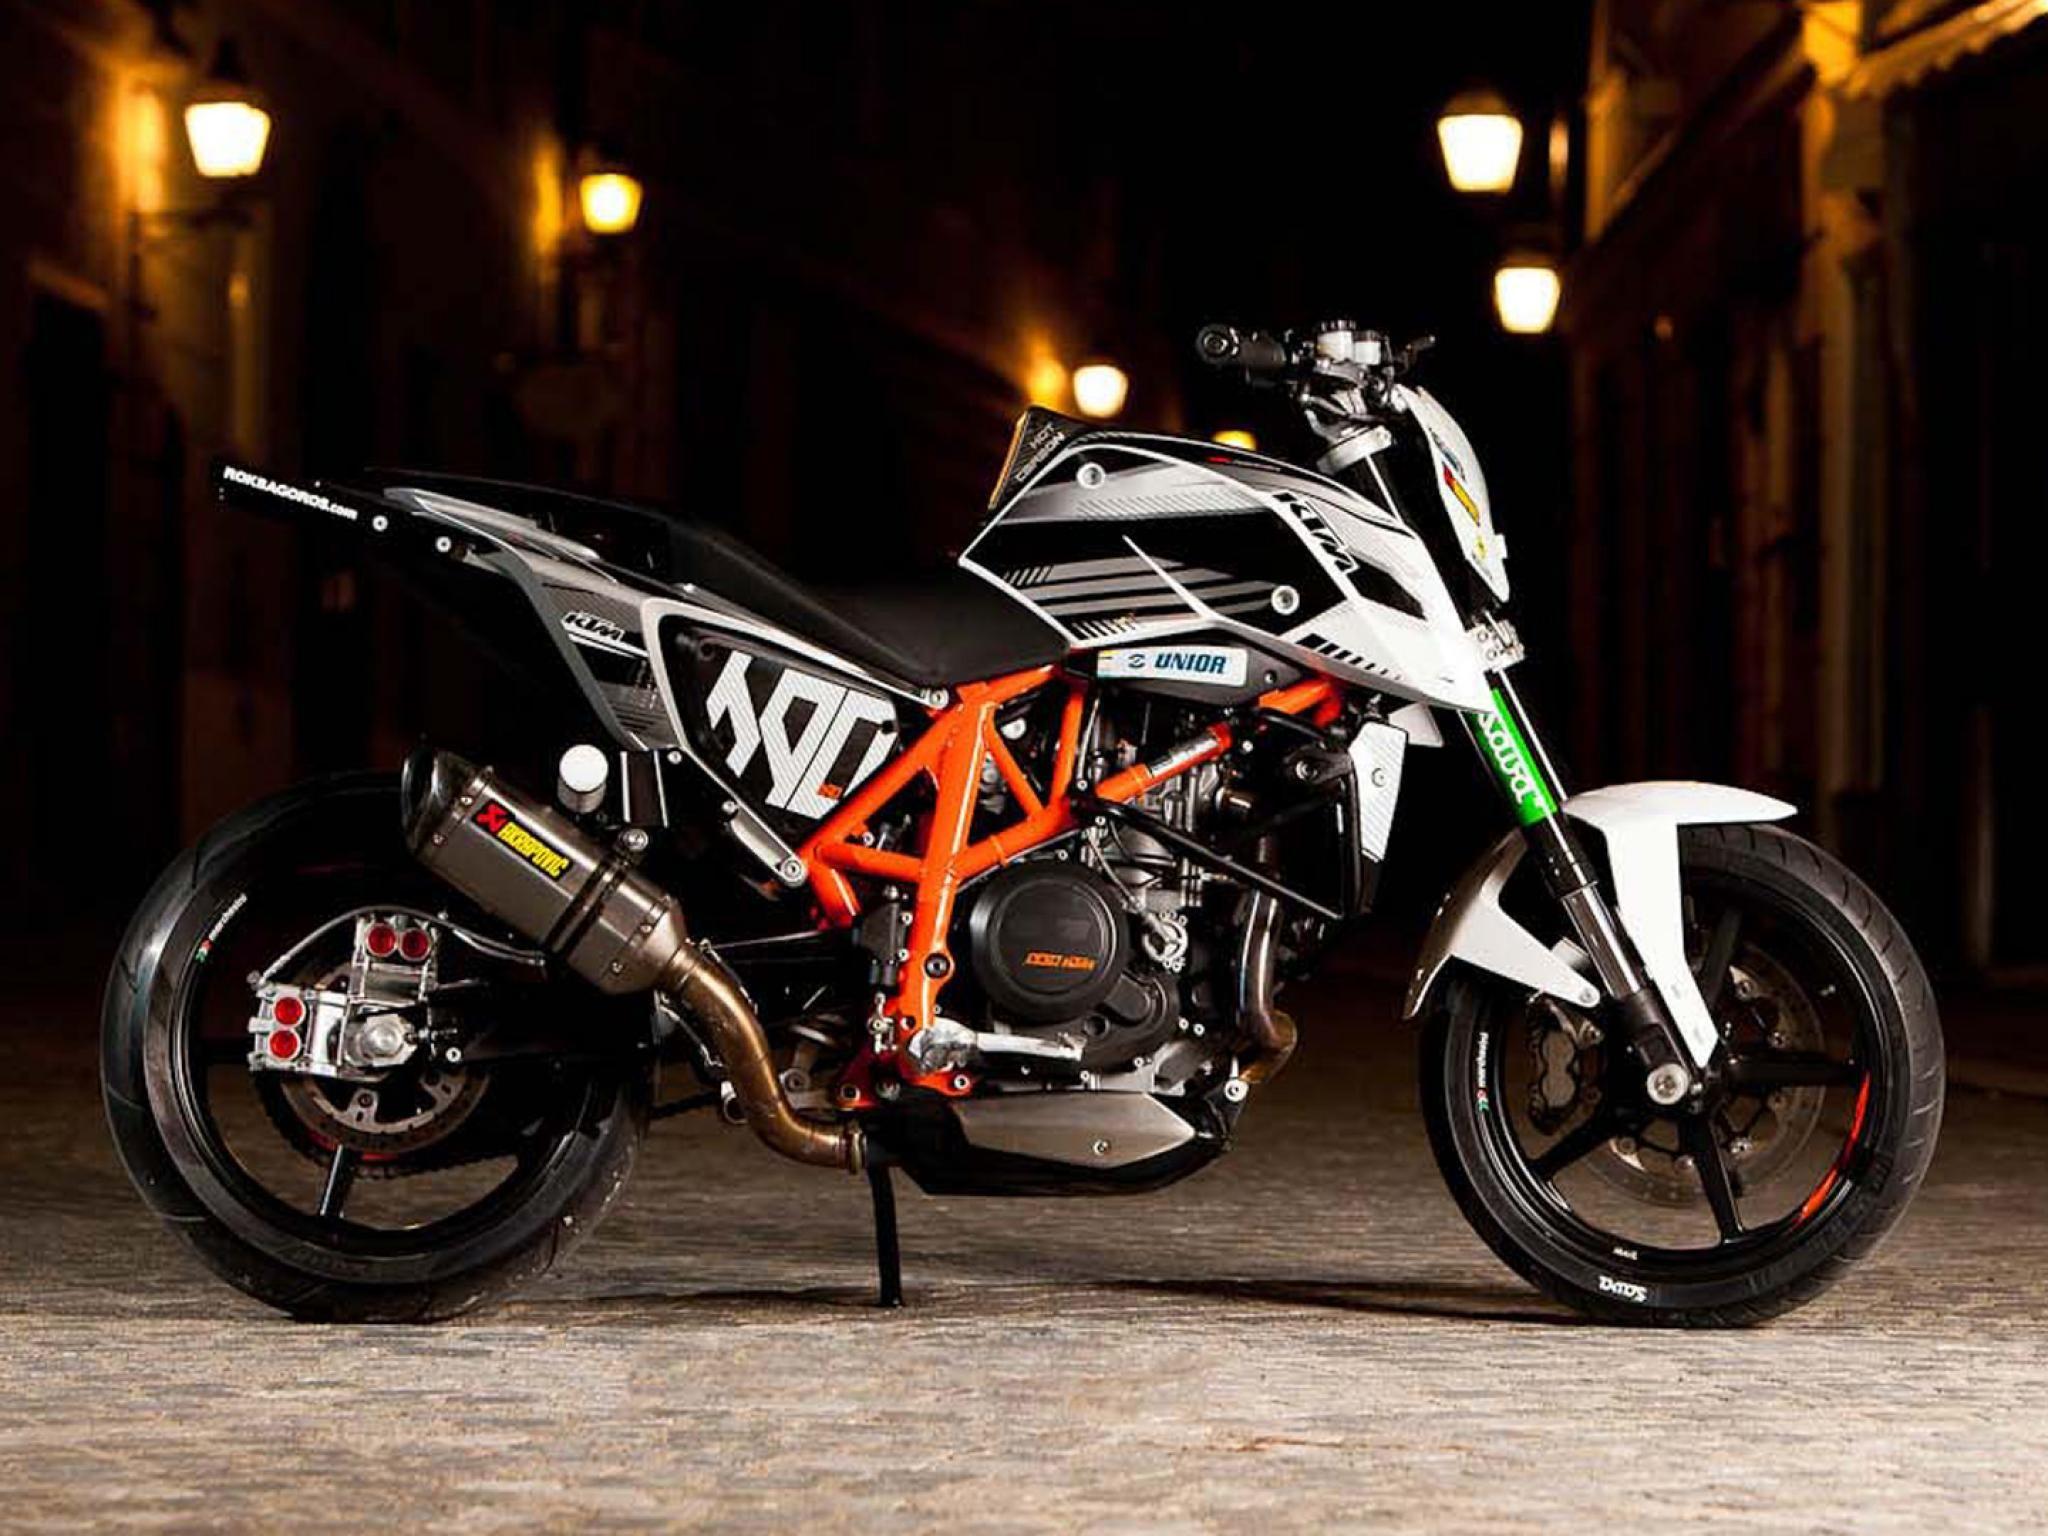 Supermoto ktm 690 stunt concept bikemotorcycletuned car tuning car - Rok Bagoro S New Ktm 690 Duke Stunt Bike